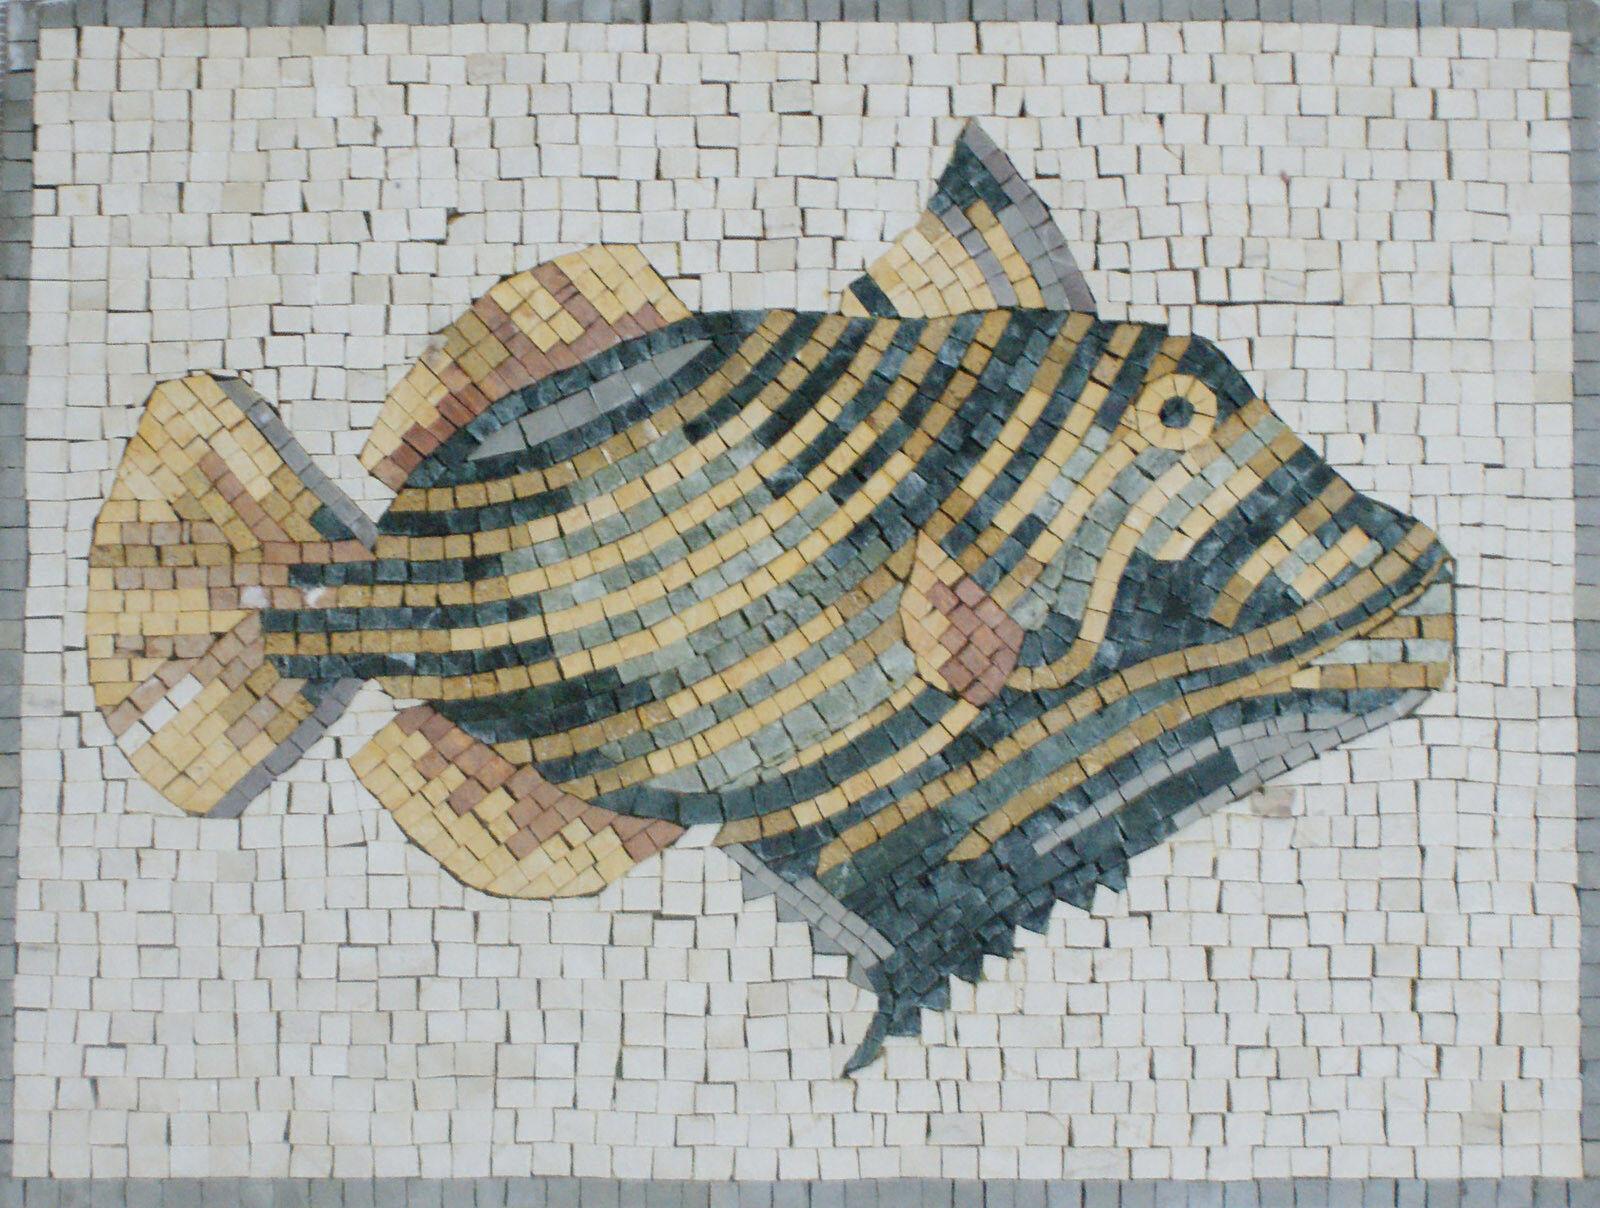 Floral Decor Farbeful Fish Sea Creatures Art Tile Stone Marble Mosaic AN931